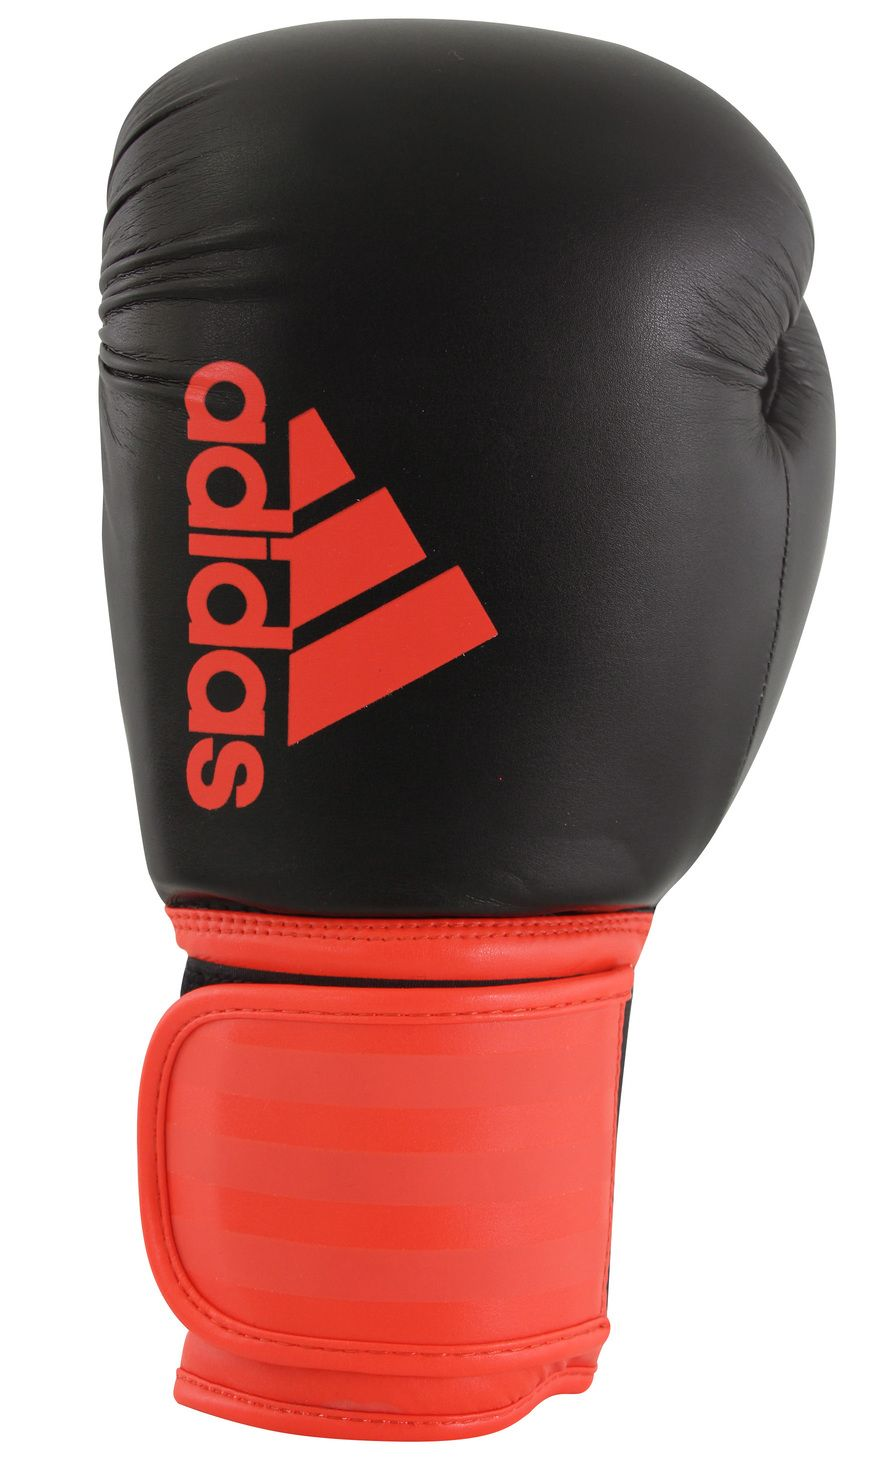 Luva de Boxe Adidas Hybrid100 Red/Black